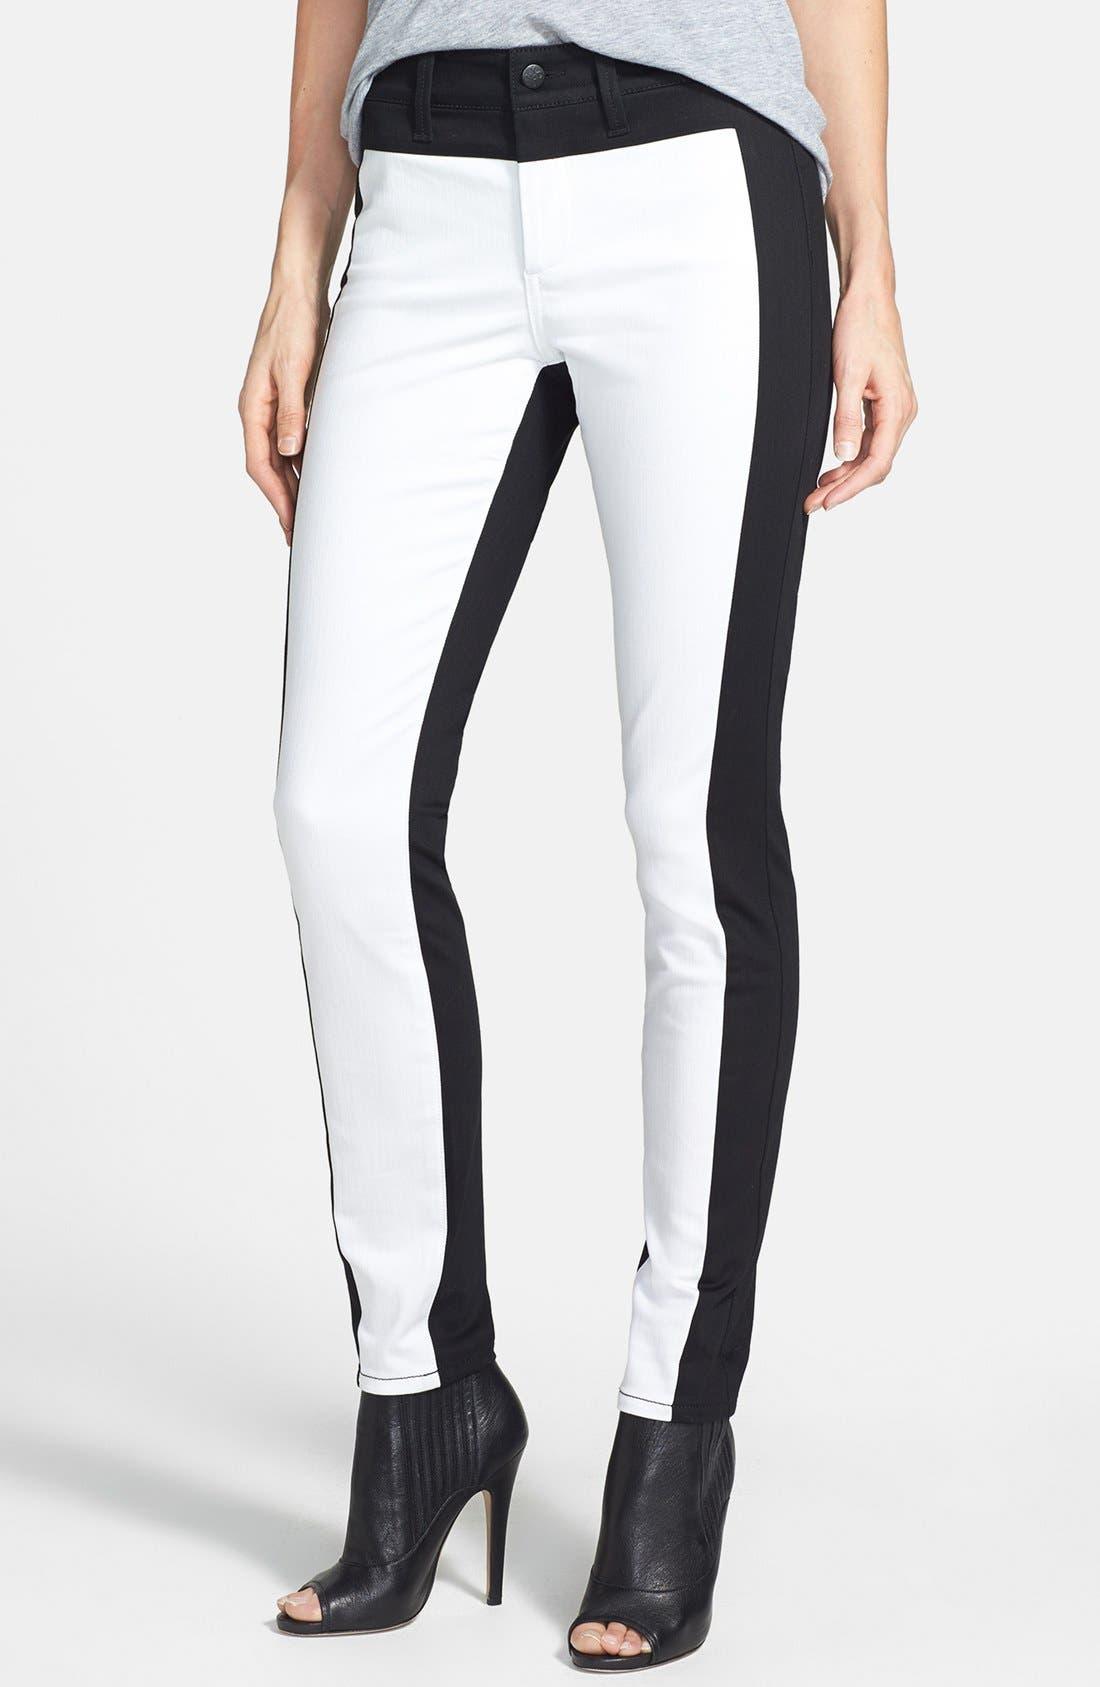 Alternate Image 1 Selected - NYDJ 'Aurora' Two-Tone Stretch Skinny Jeans (Optic White/Black)